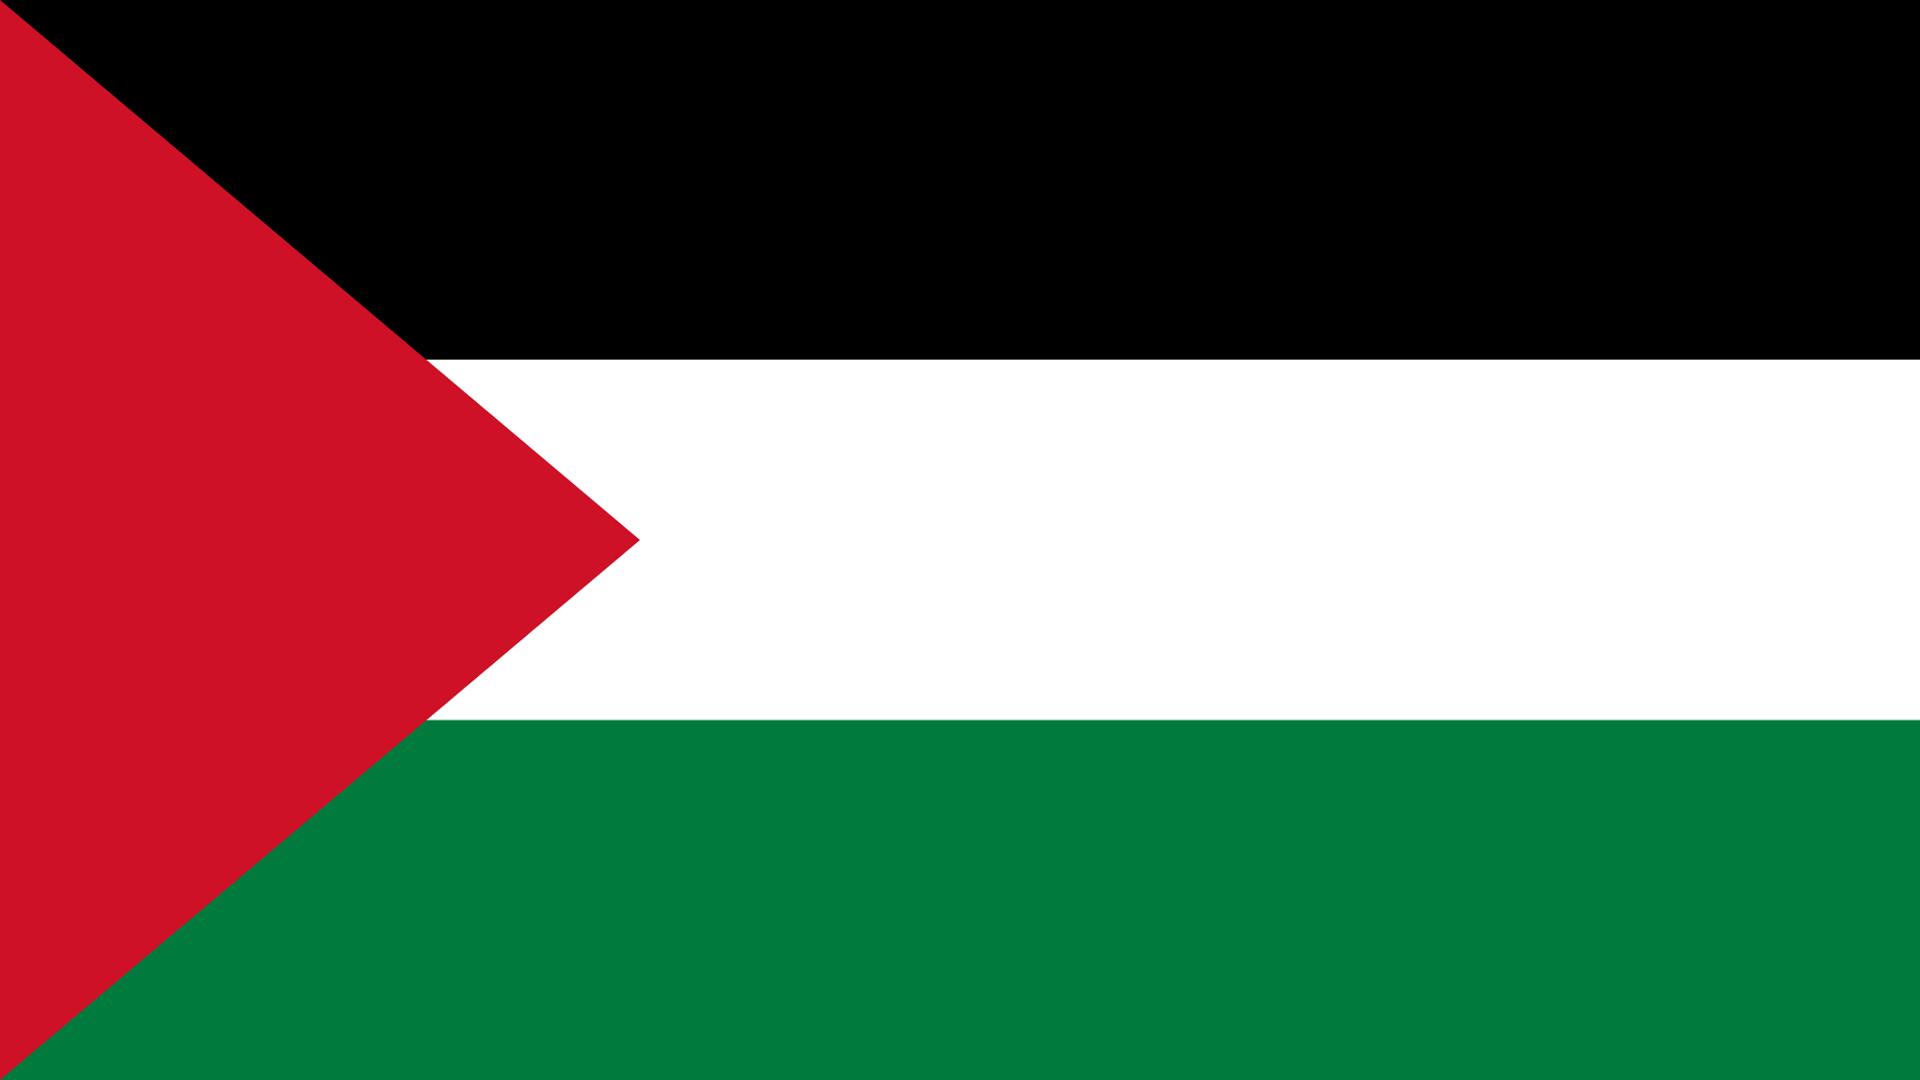 49+] Palestinian Flag Wallpaper On WallpaperSafari